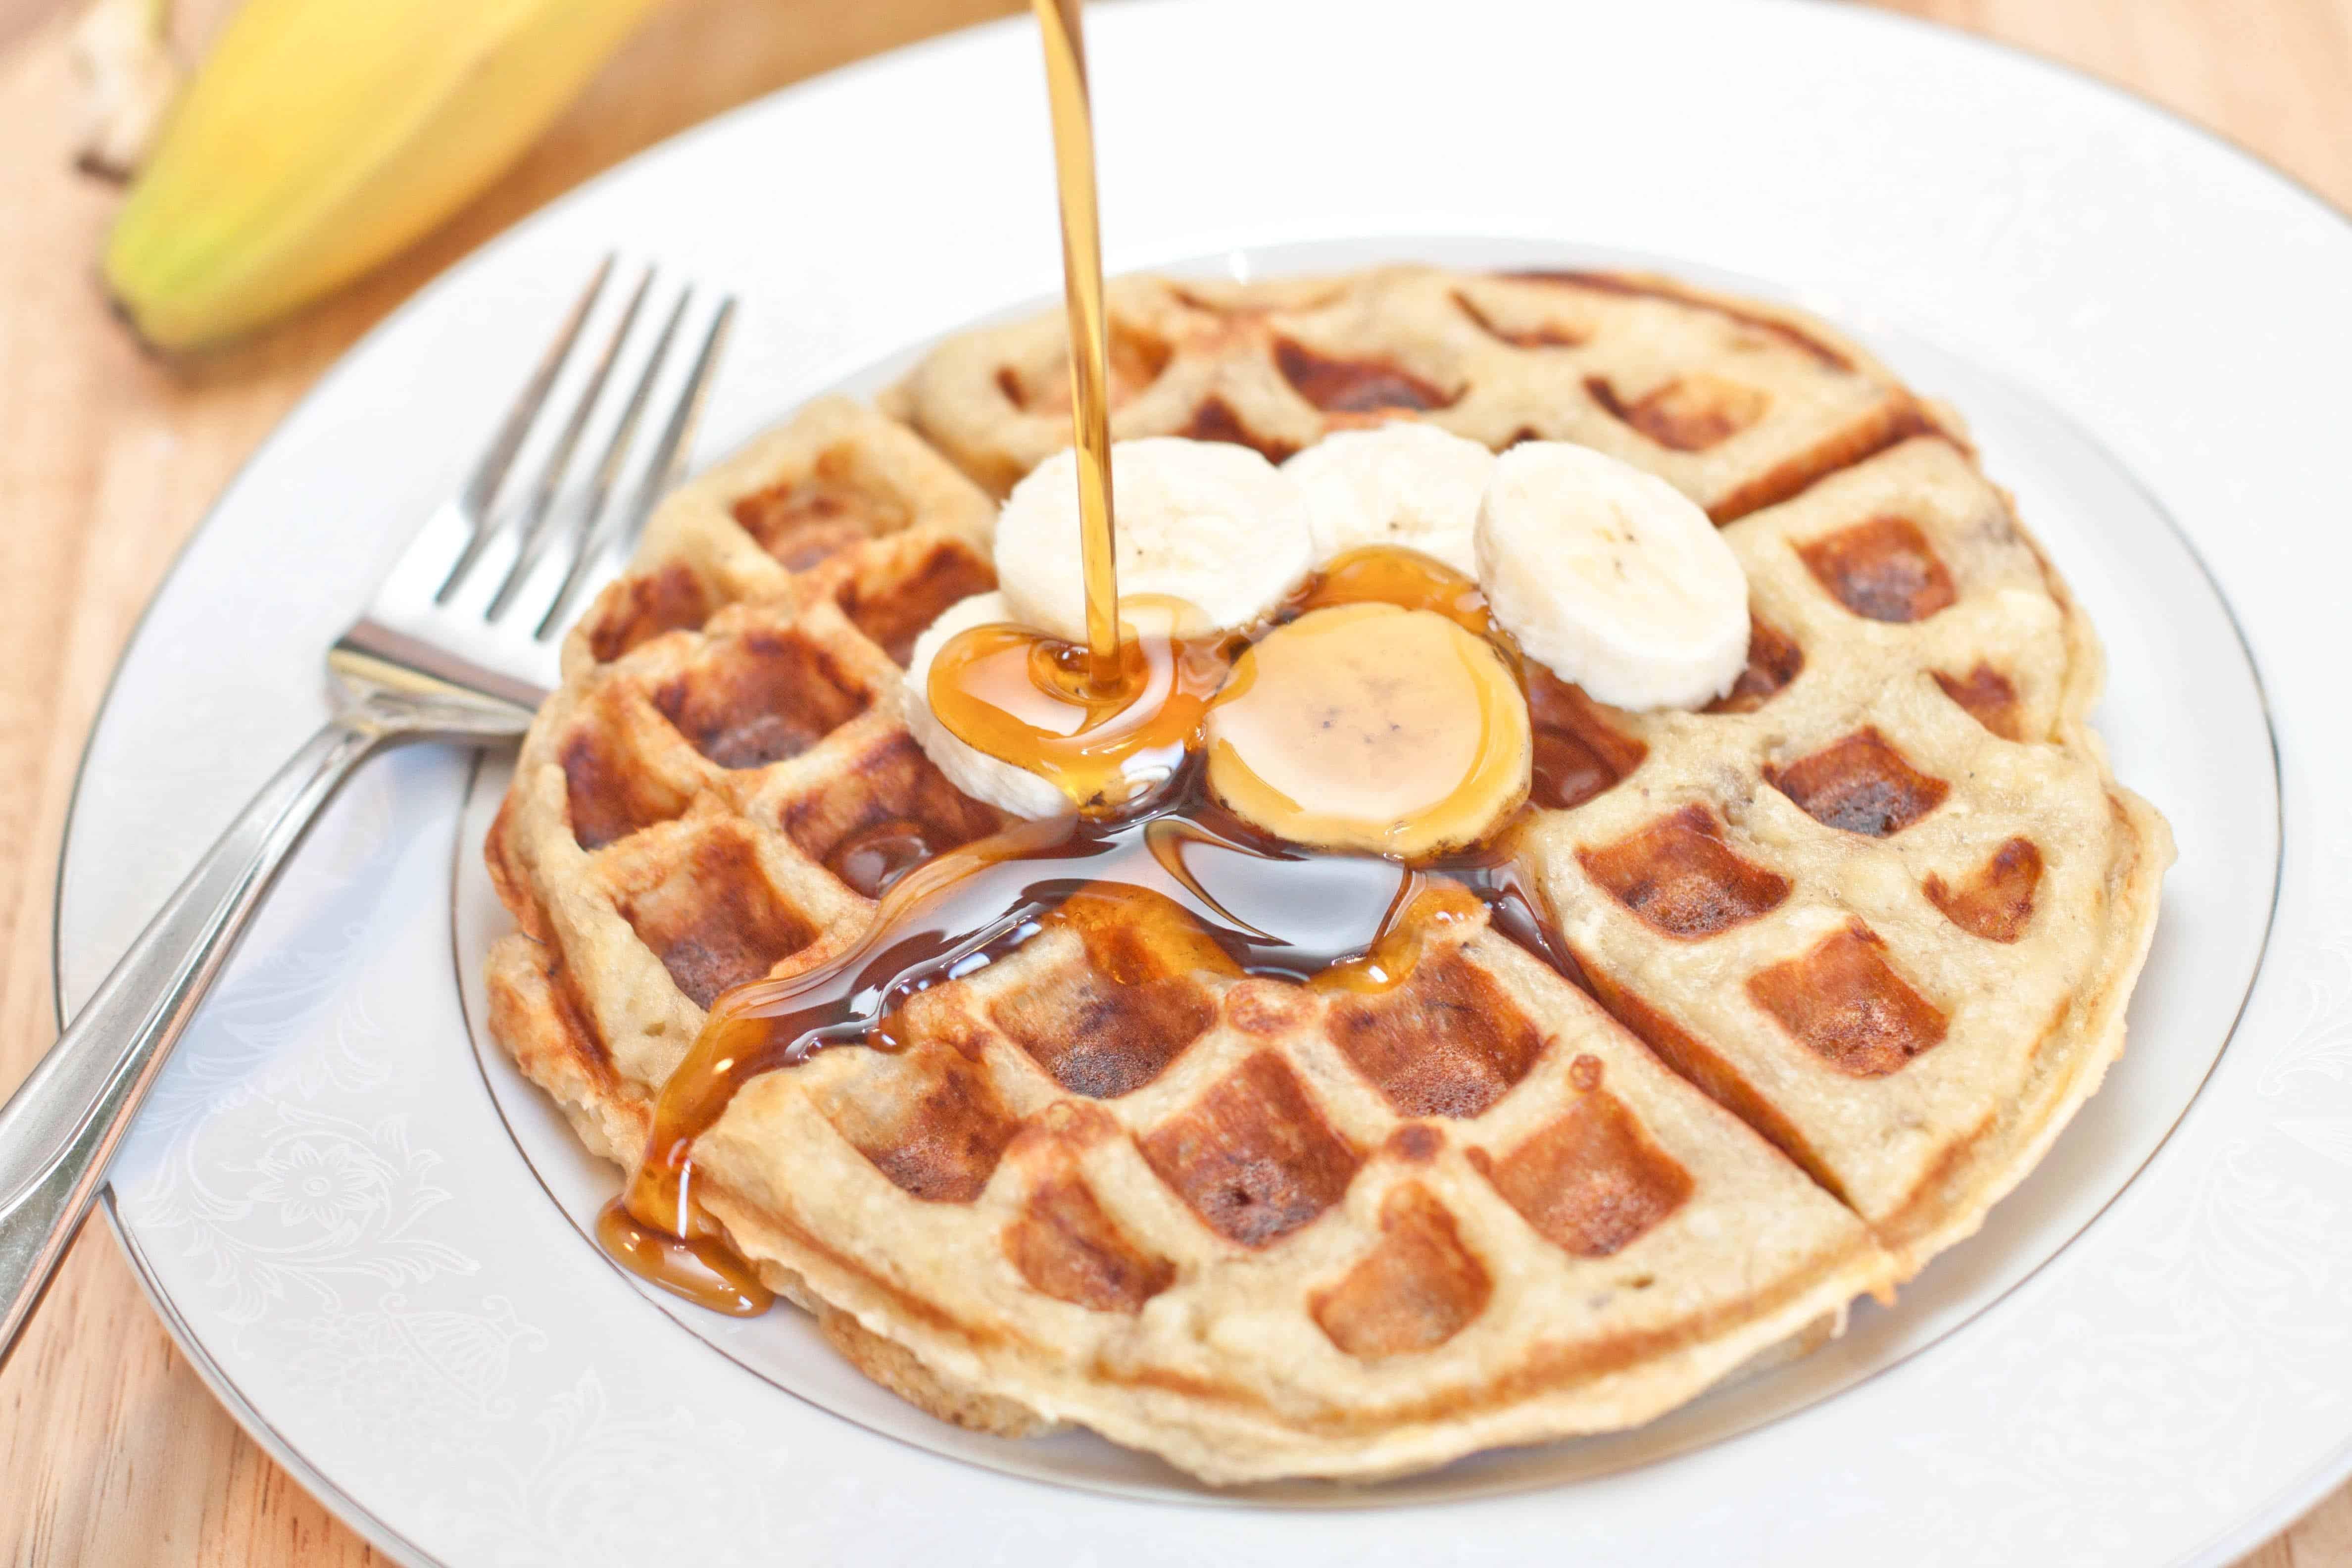 Banana Waffles from scratch